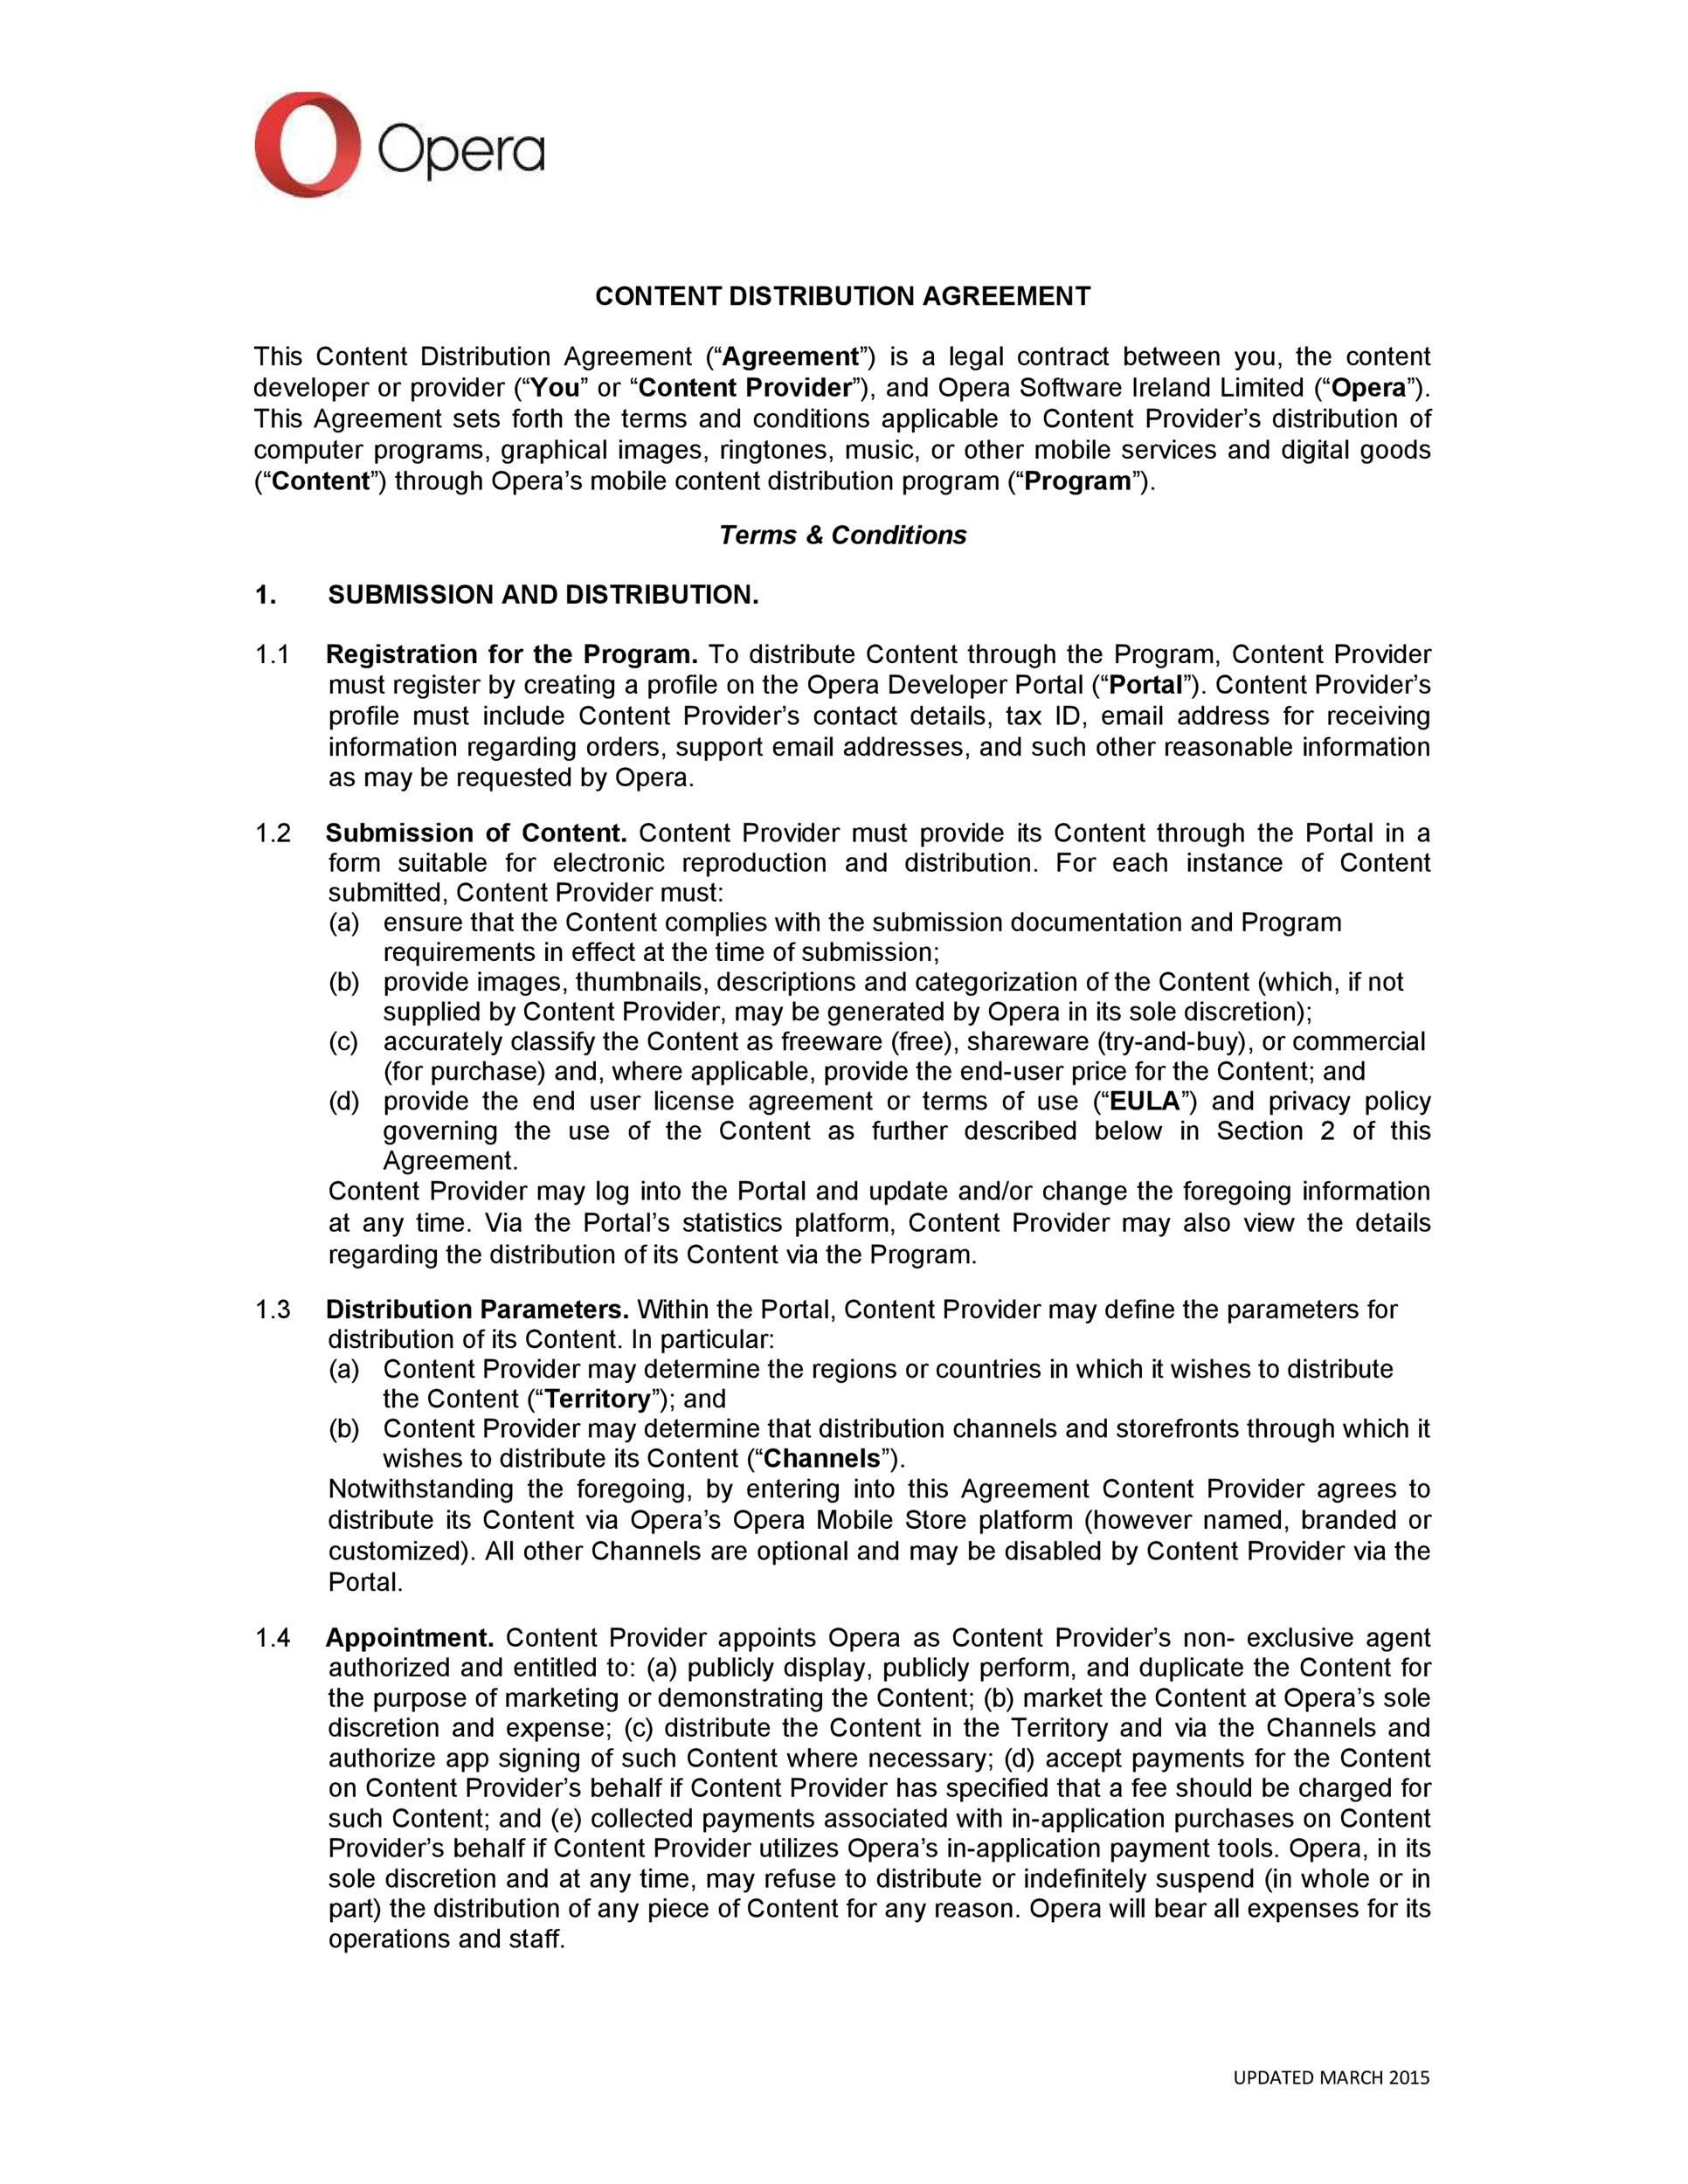 Free distribution agreement 45